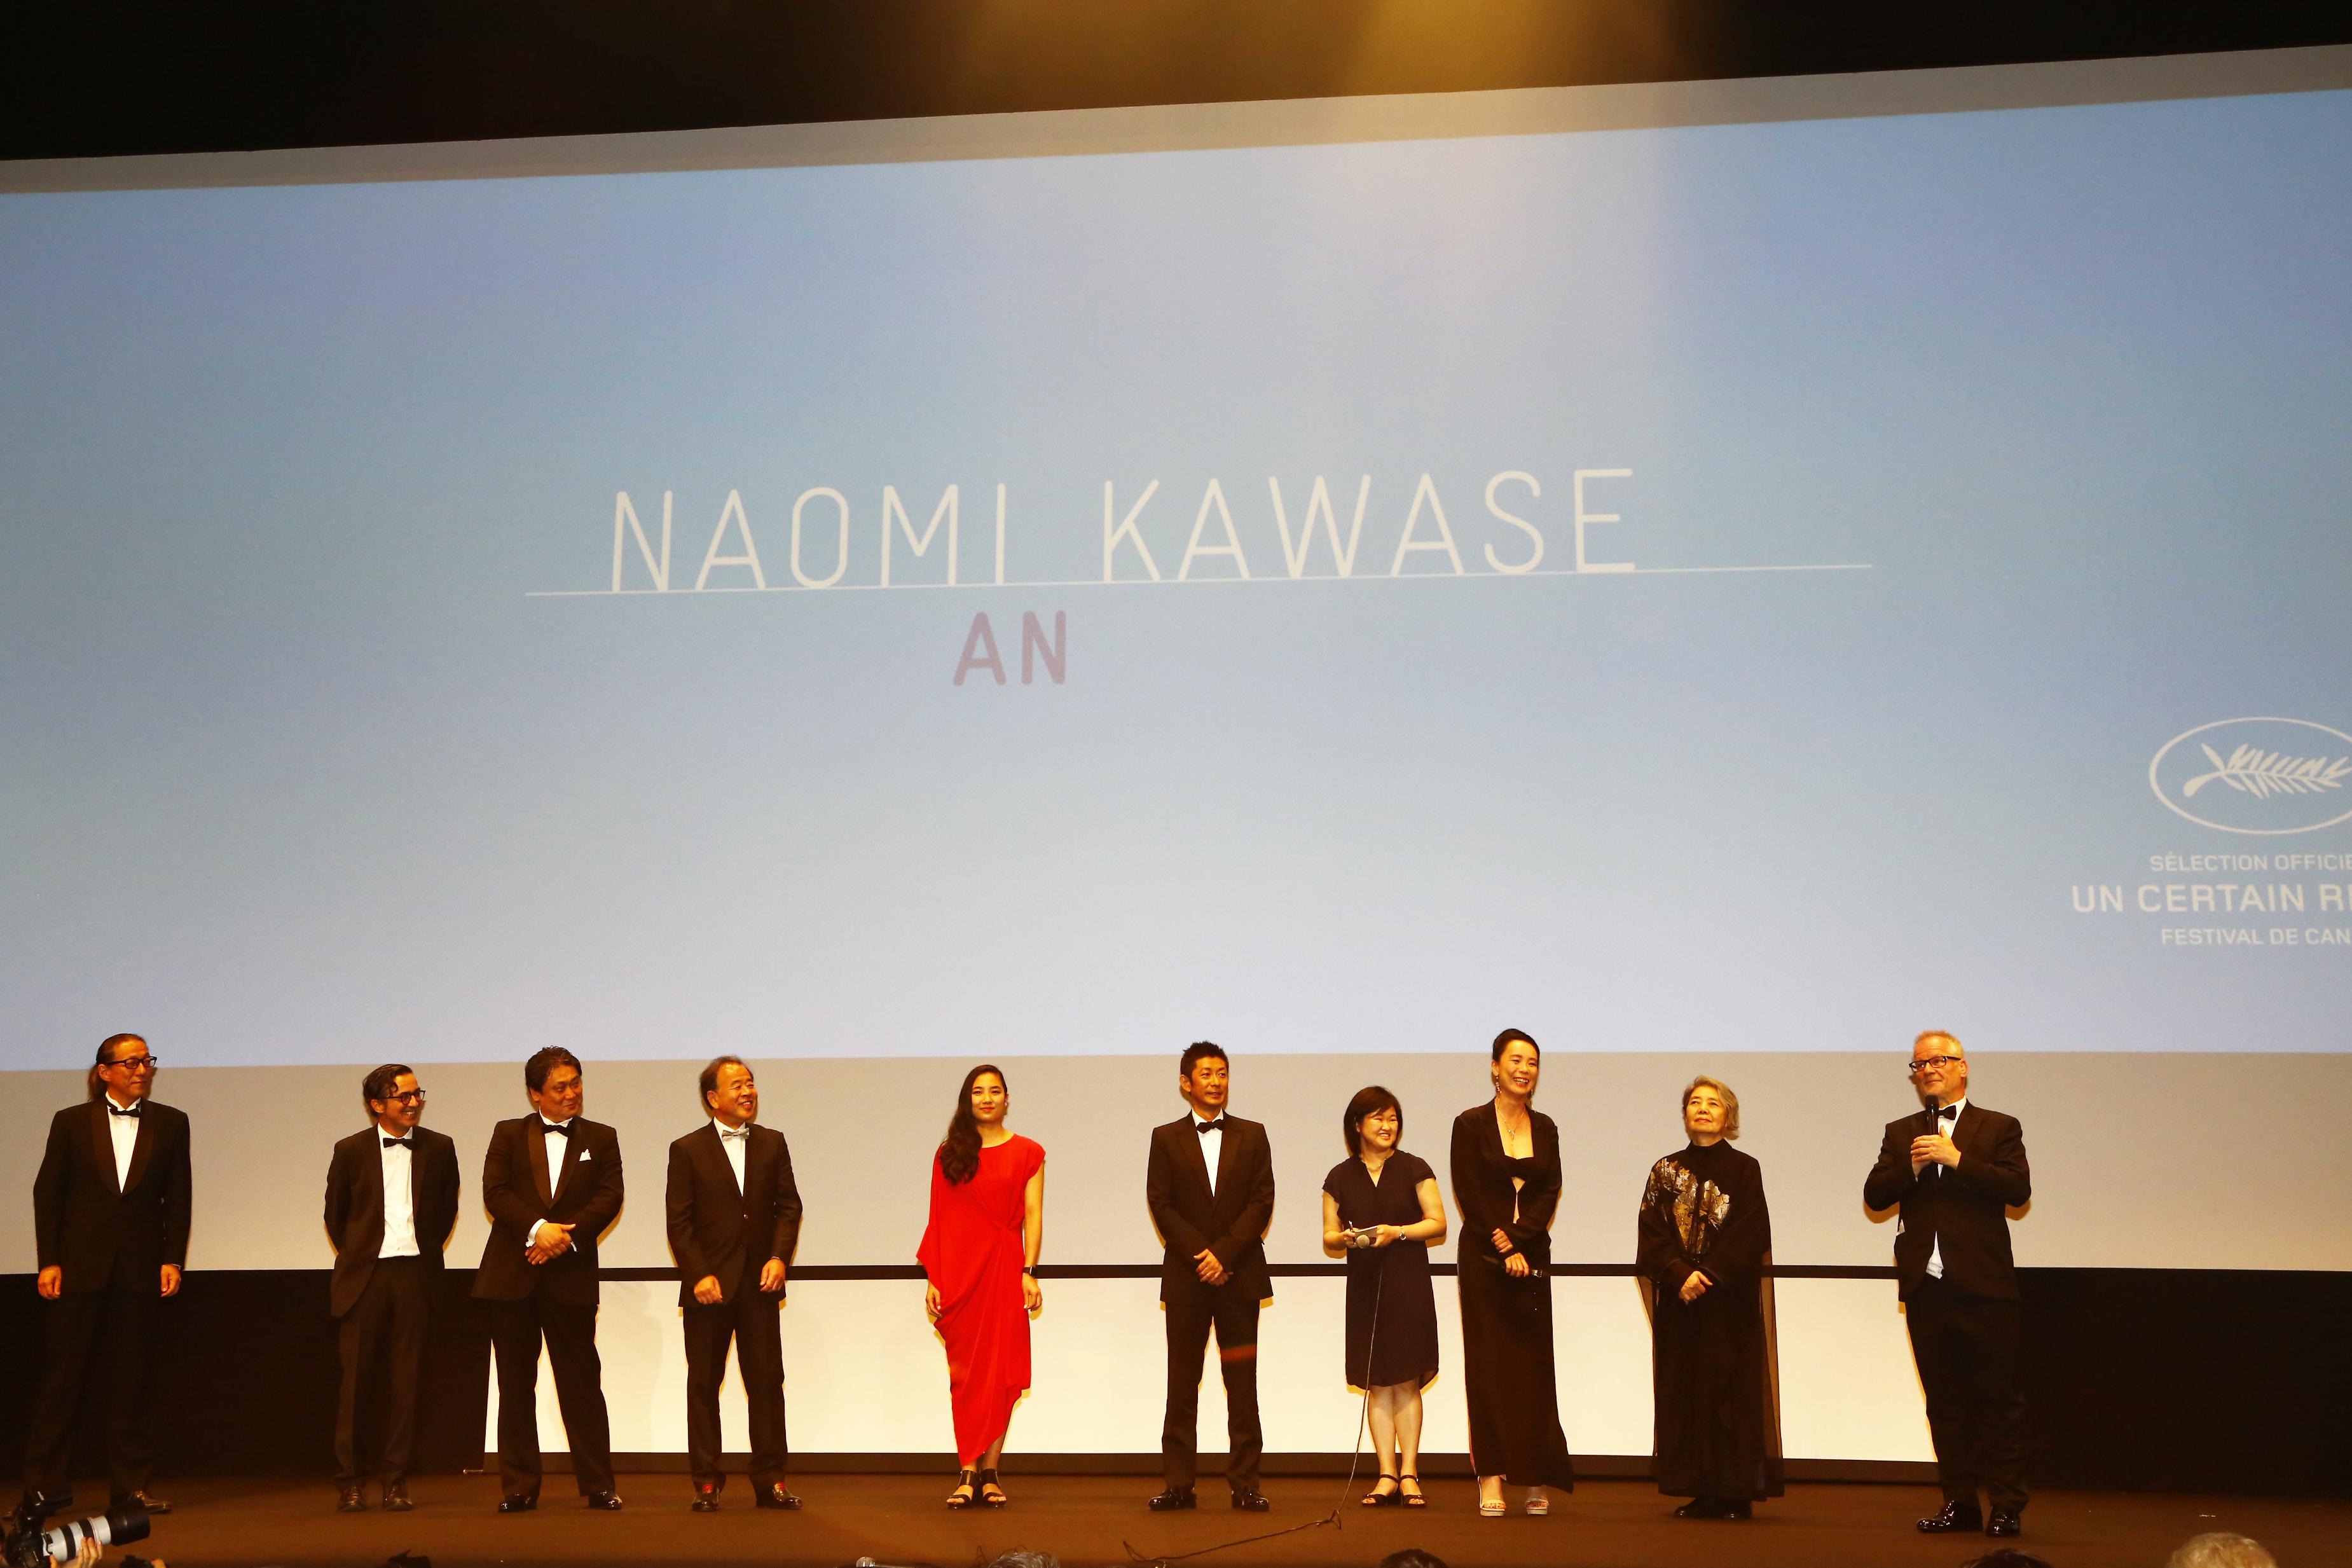 http://www.kawasenaomi.com/kumie/news/Cannes_R4A7007.jpg